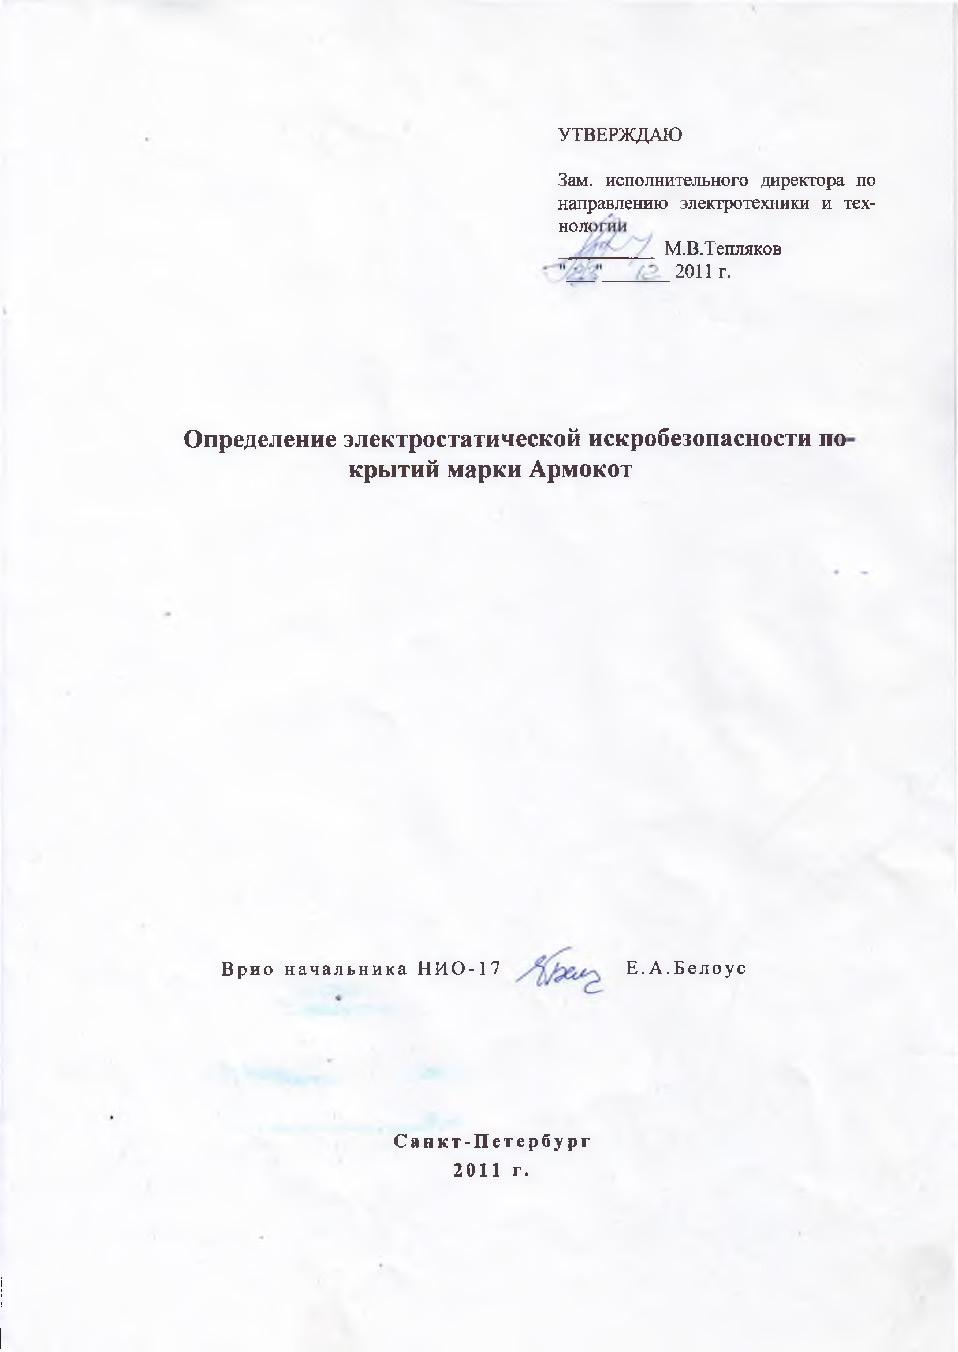 Искробезопасность Армокот 01 C101 F100 T700 V500 S70 Z600_Страница_01